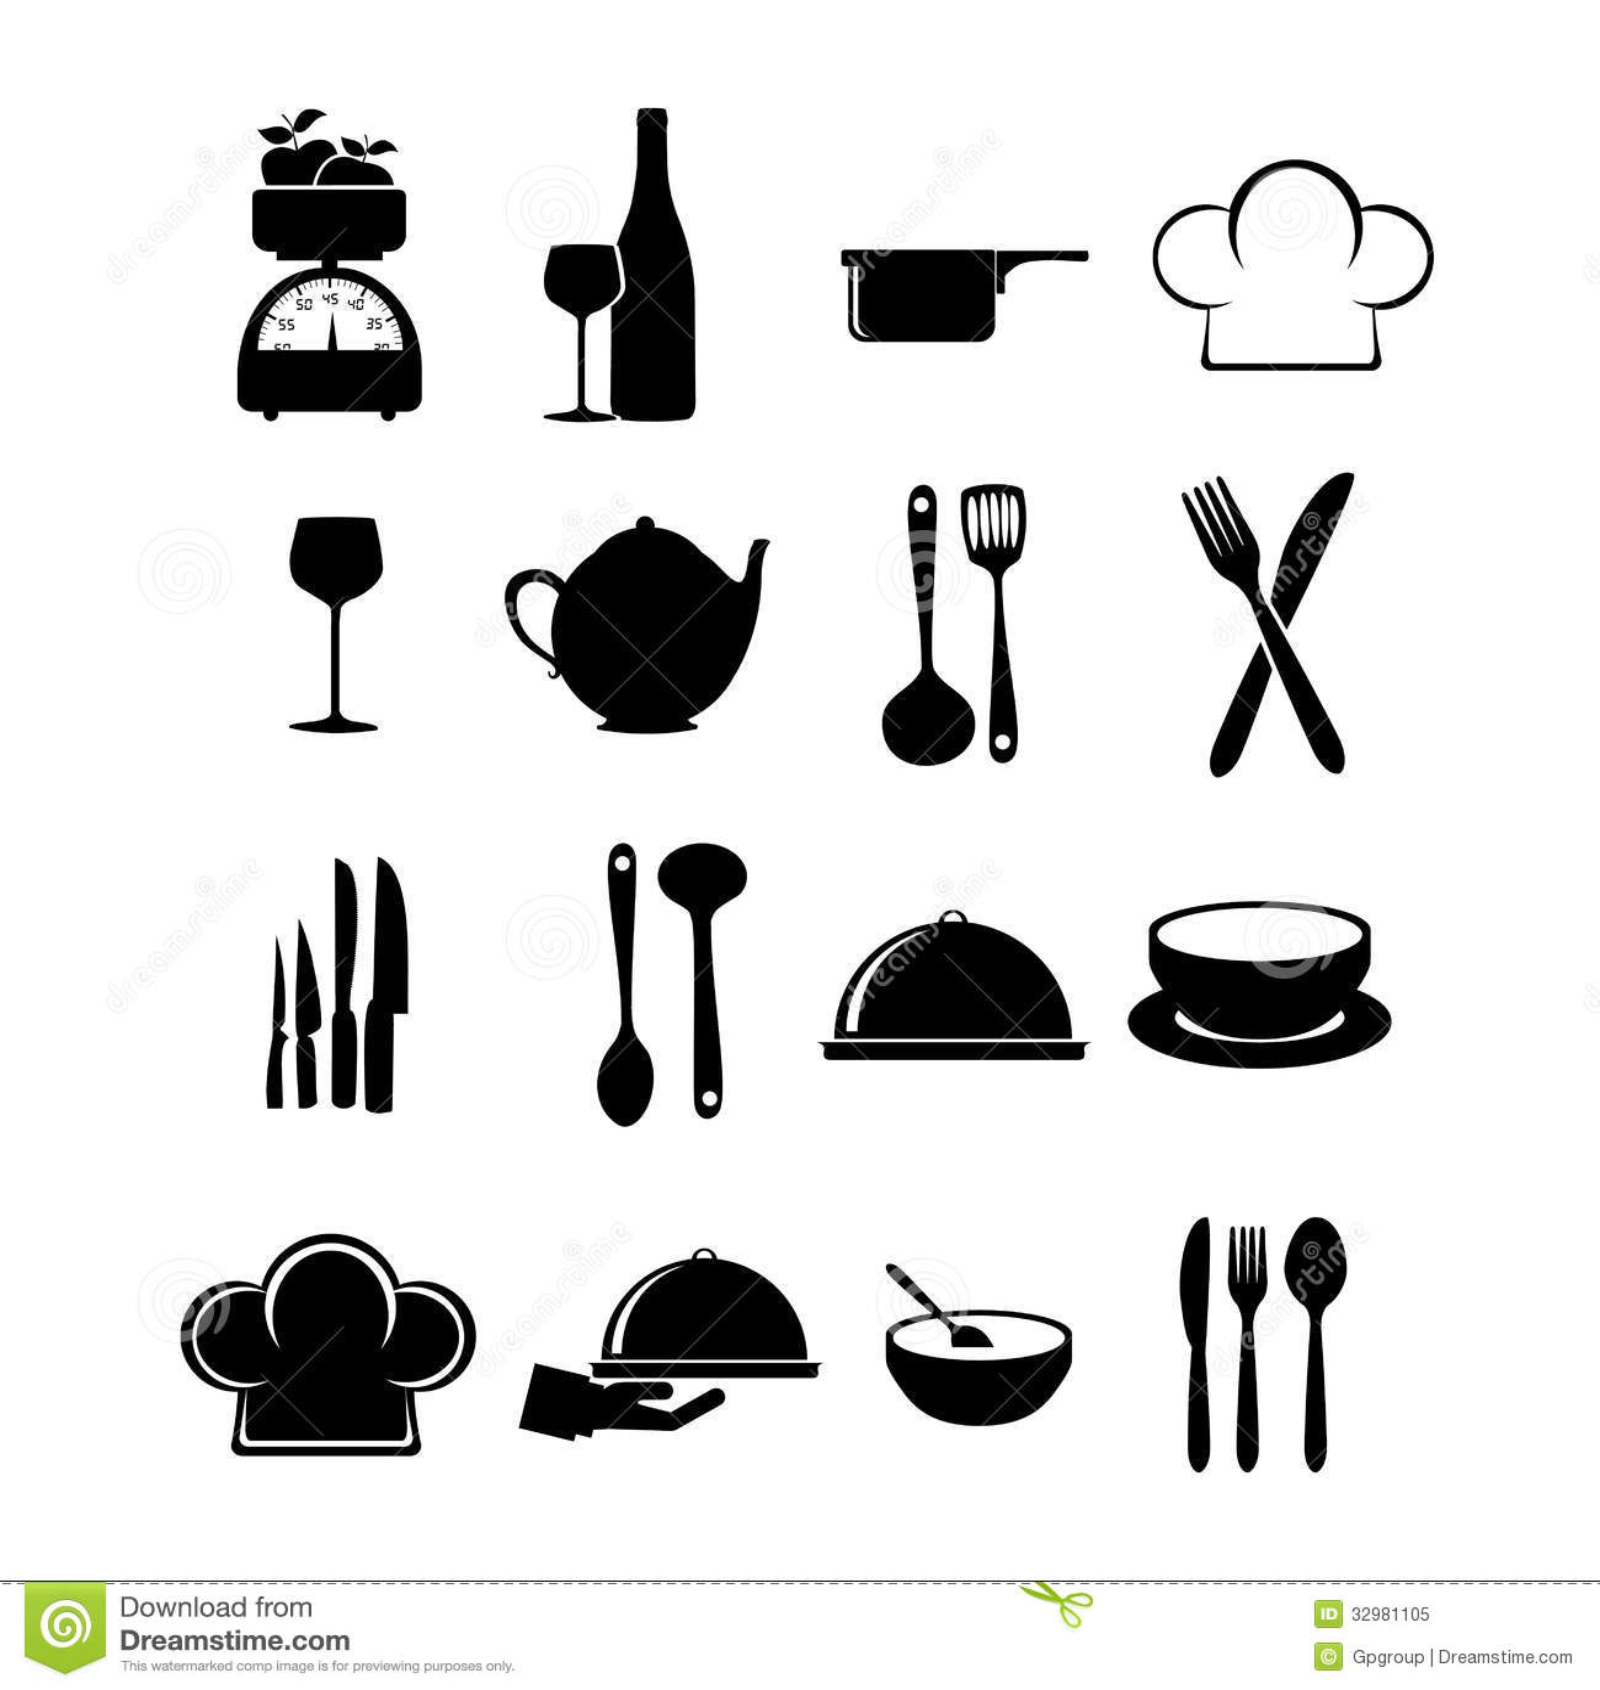 restaurant clipart vector free - photo #9